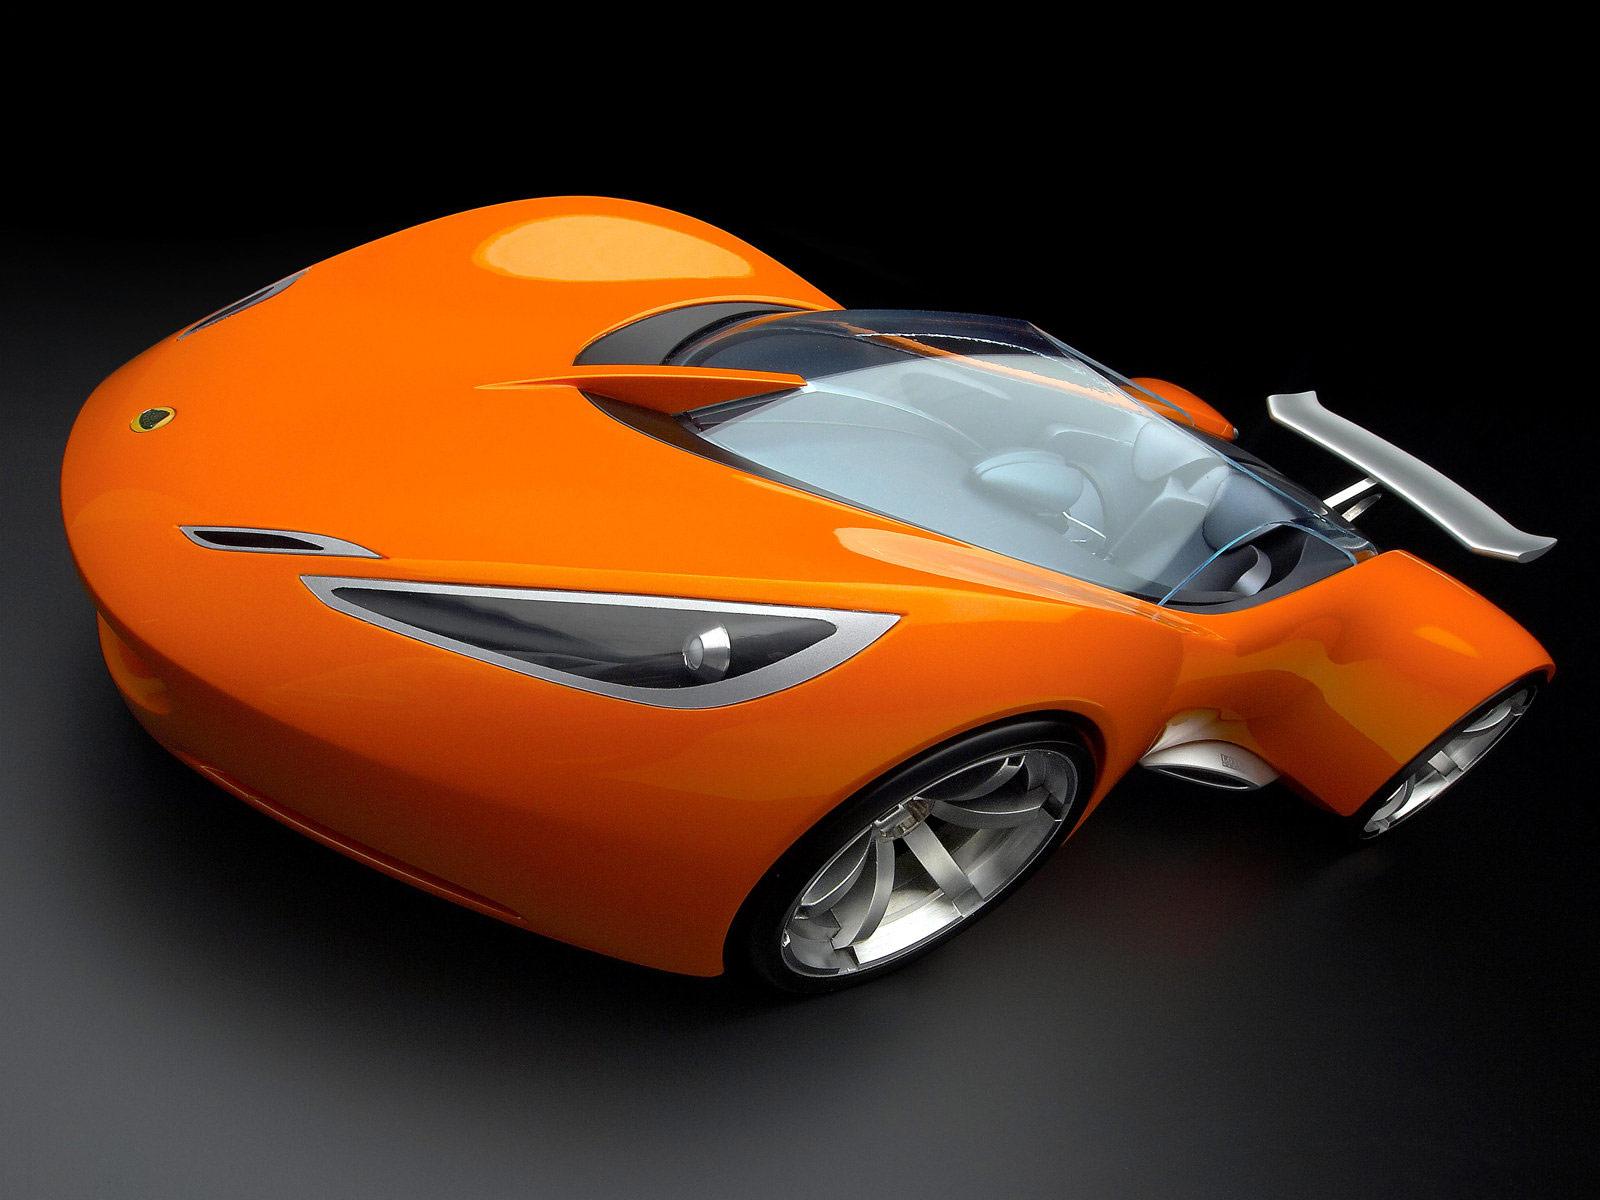 Gambar Mobil Lotus Hot Wheels Concept